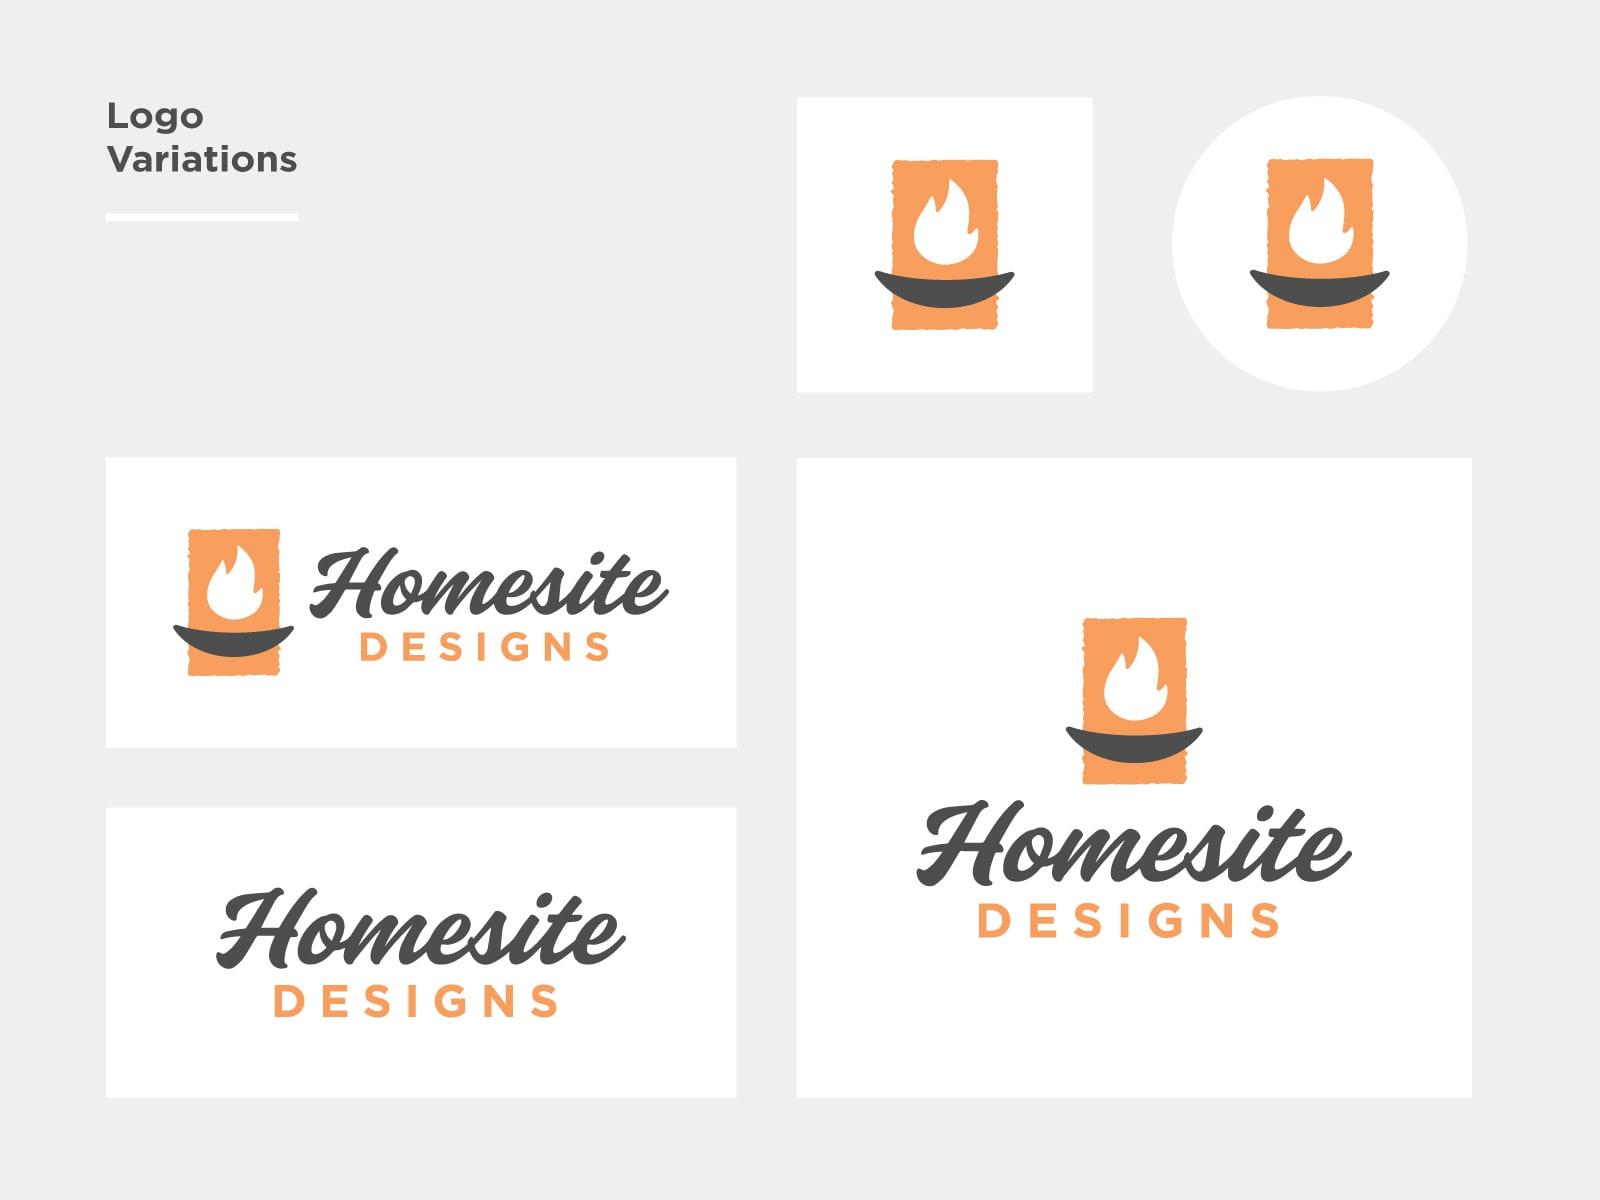 homesite-designs.jpg